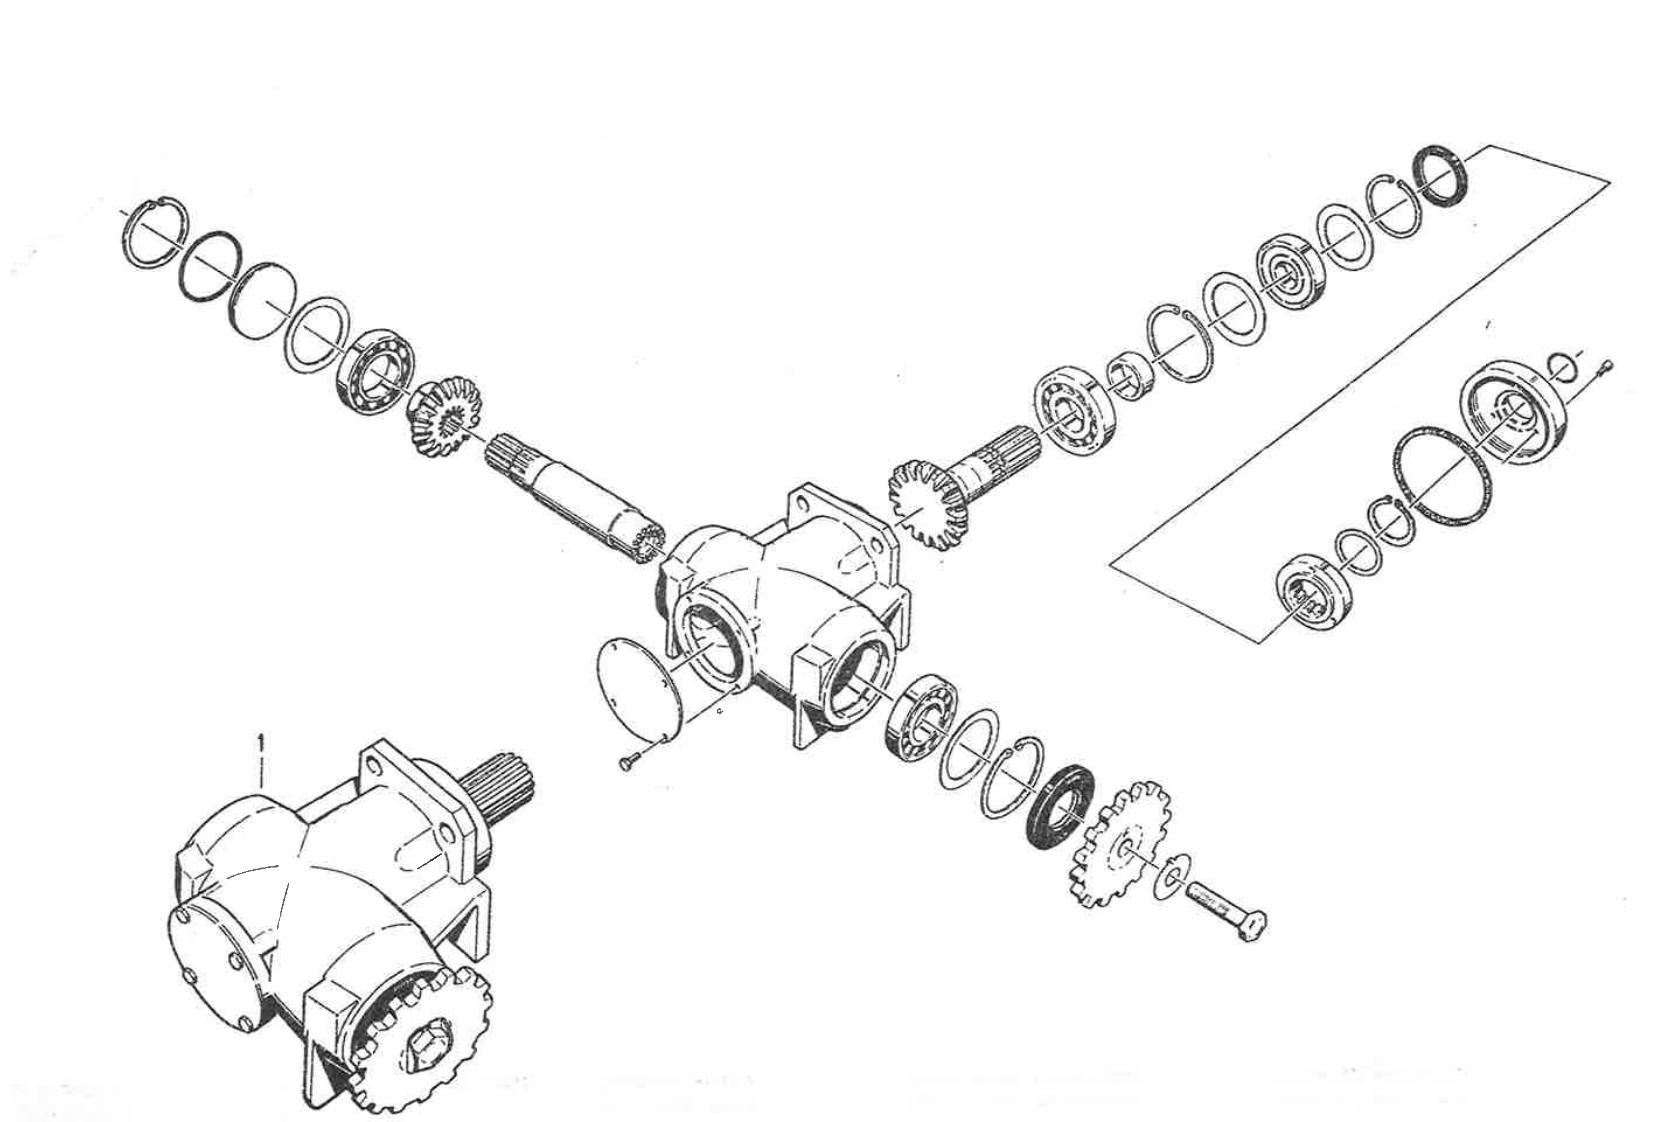 525_1997_180_Kegelradgetriebe_Steigschnecke